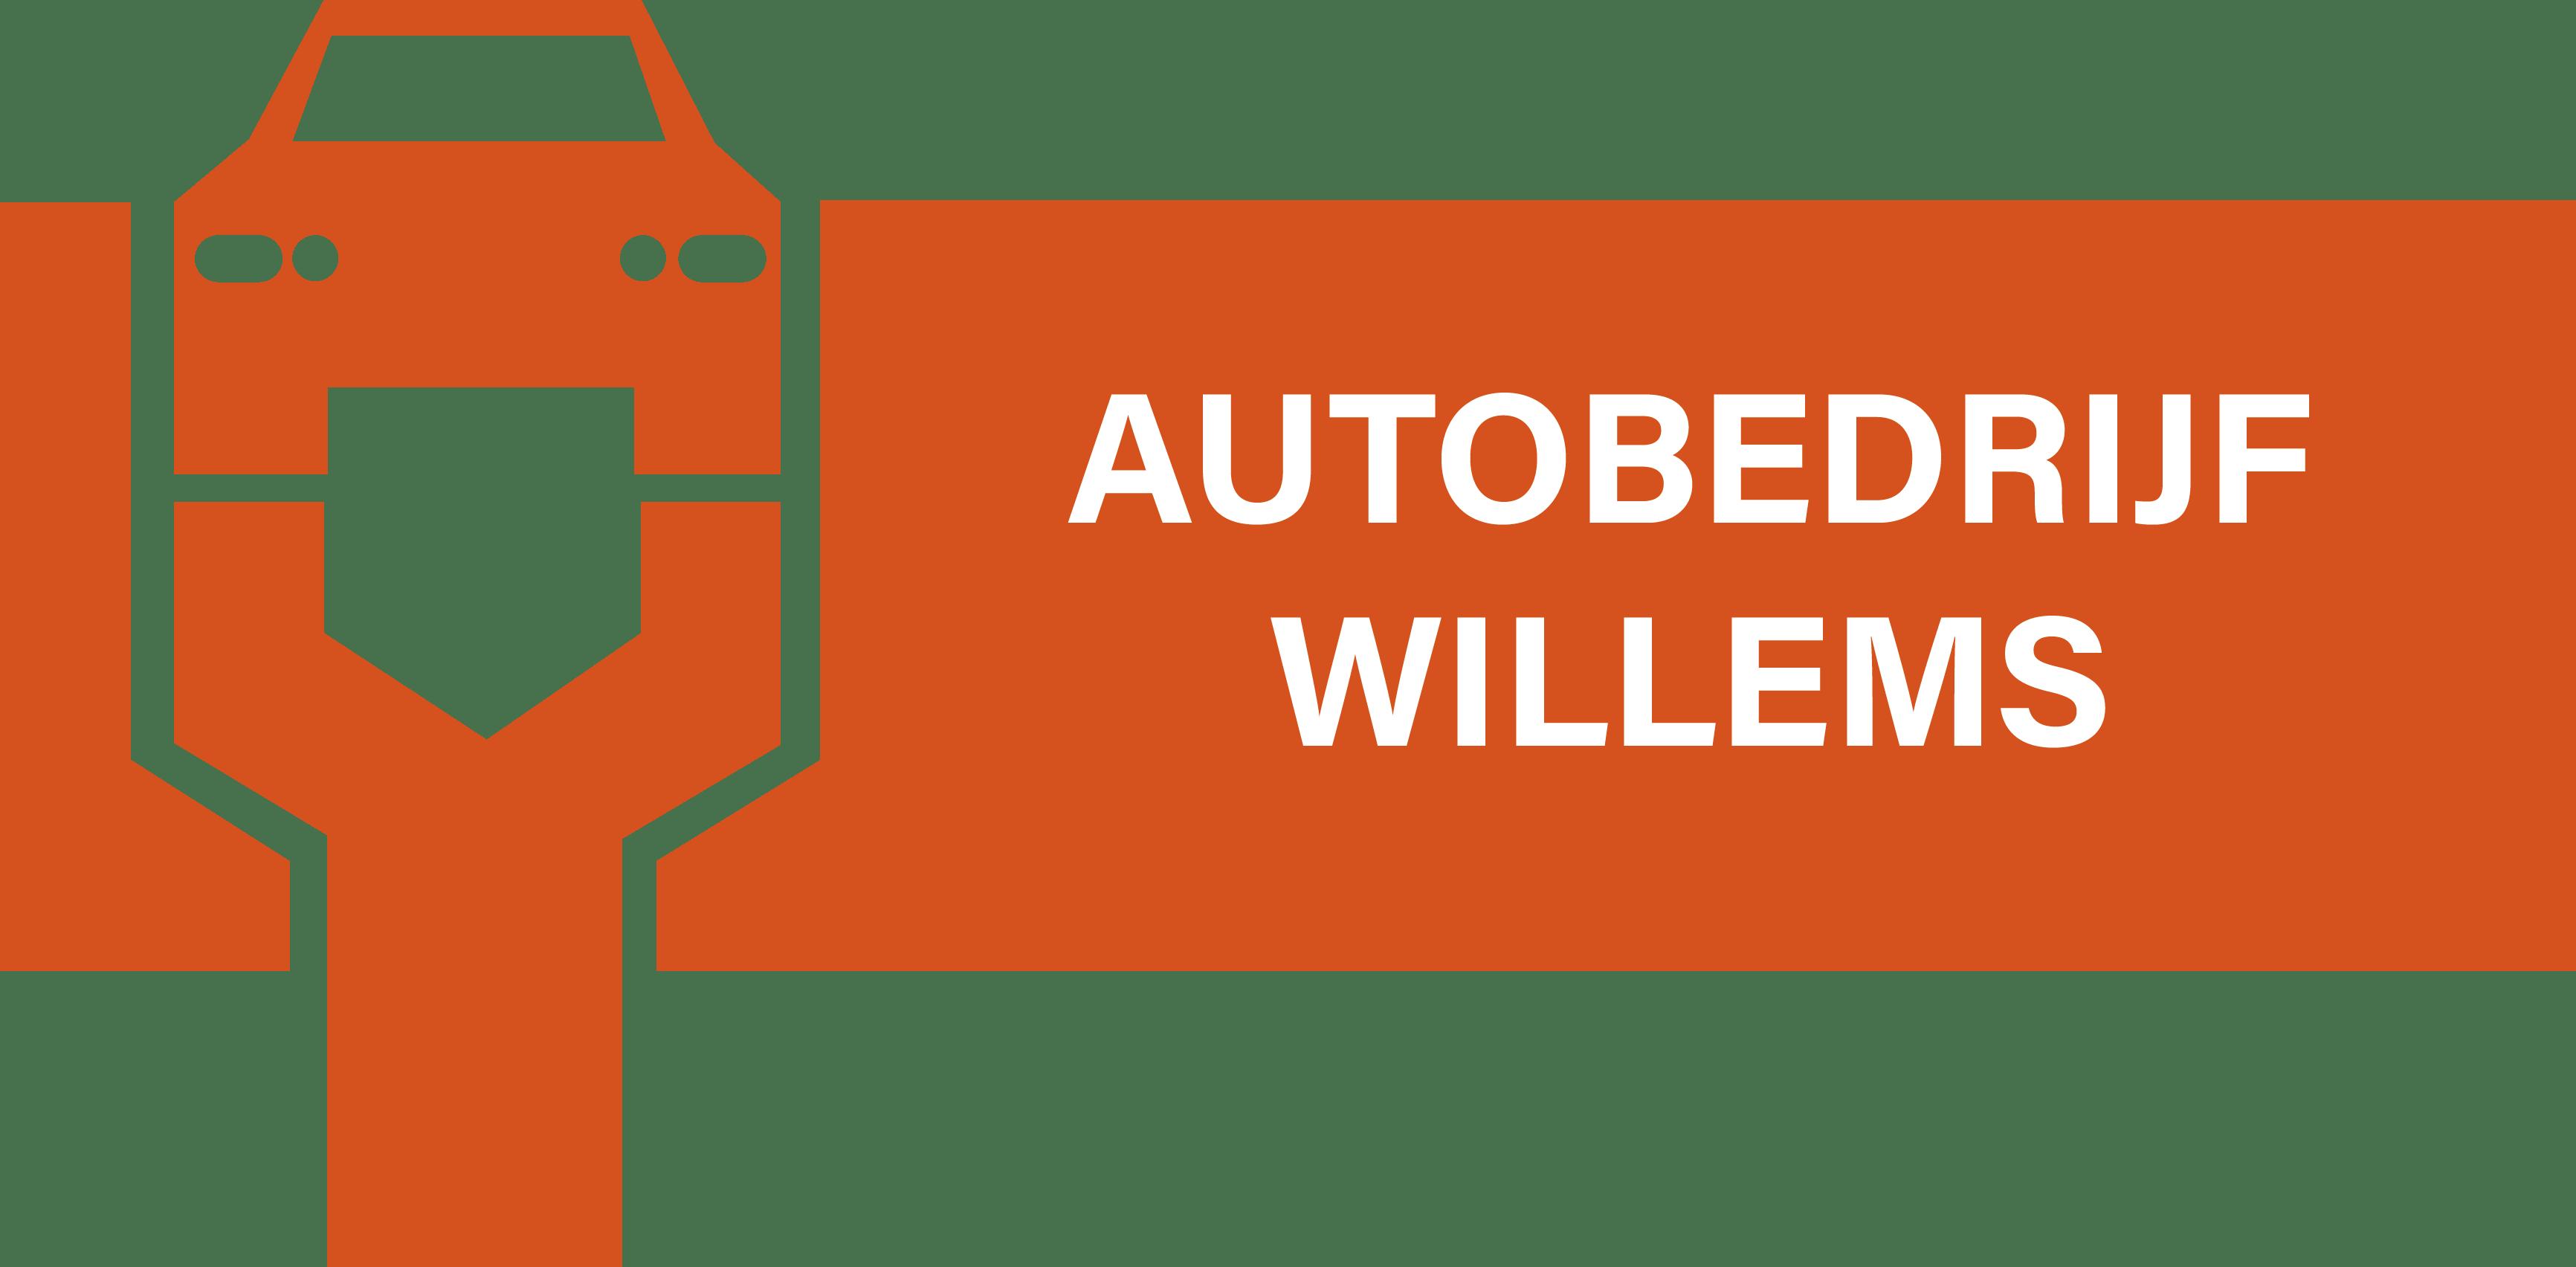 Autobedrijf Willems